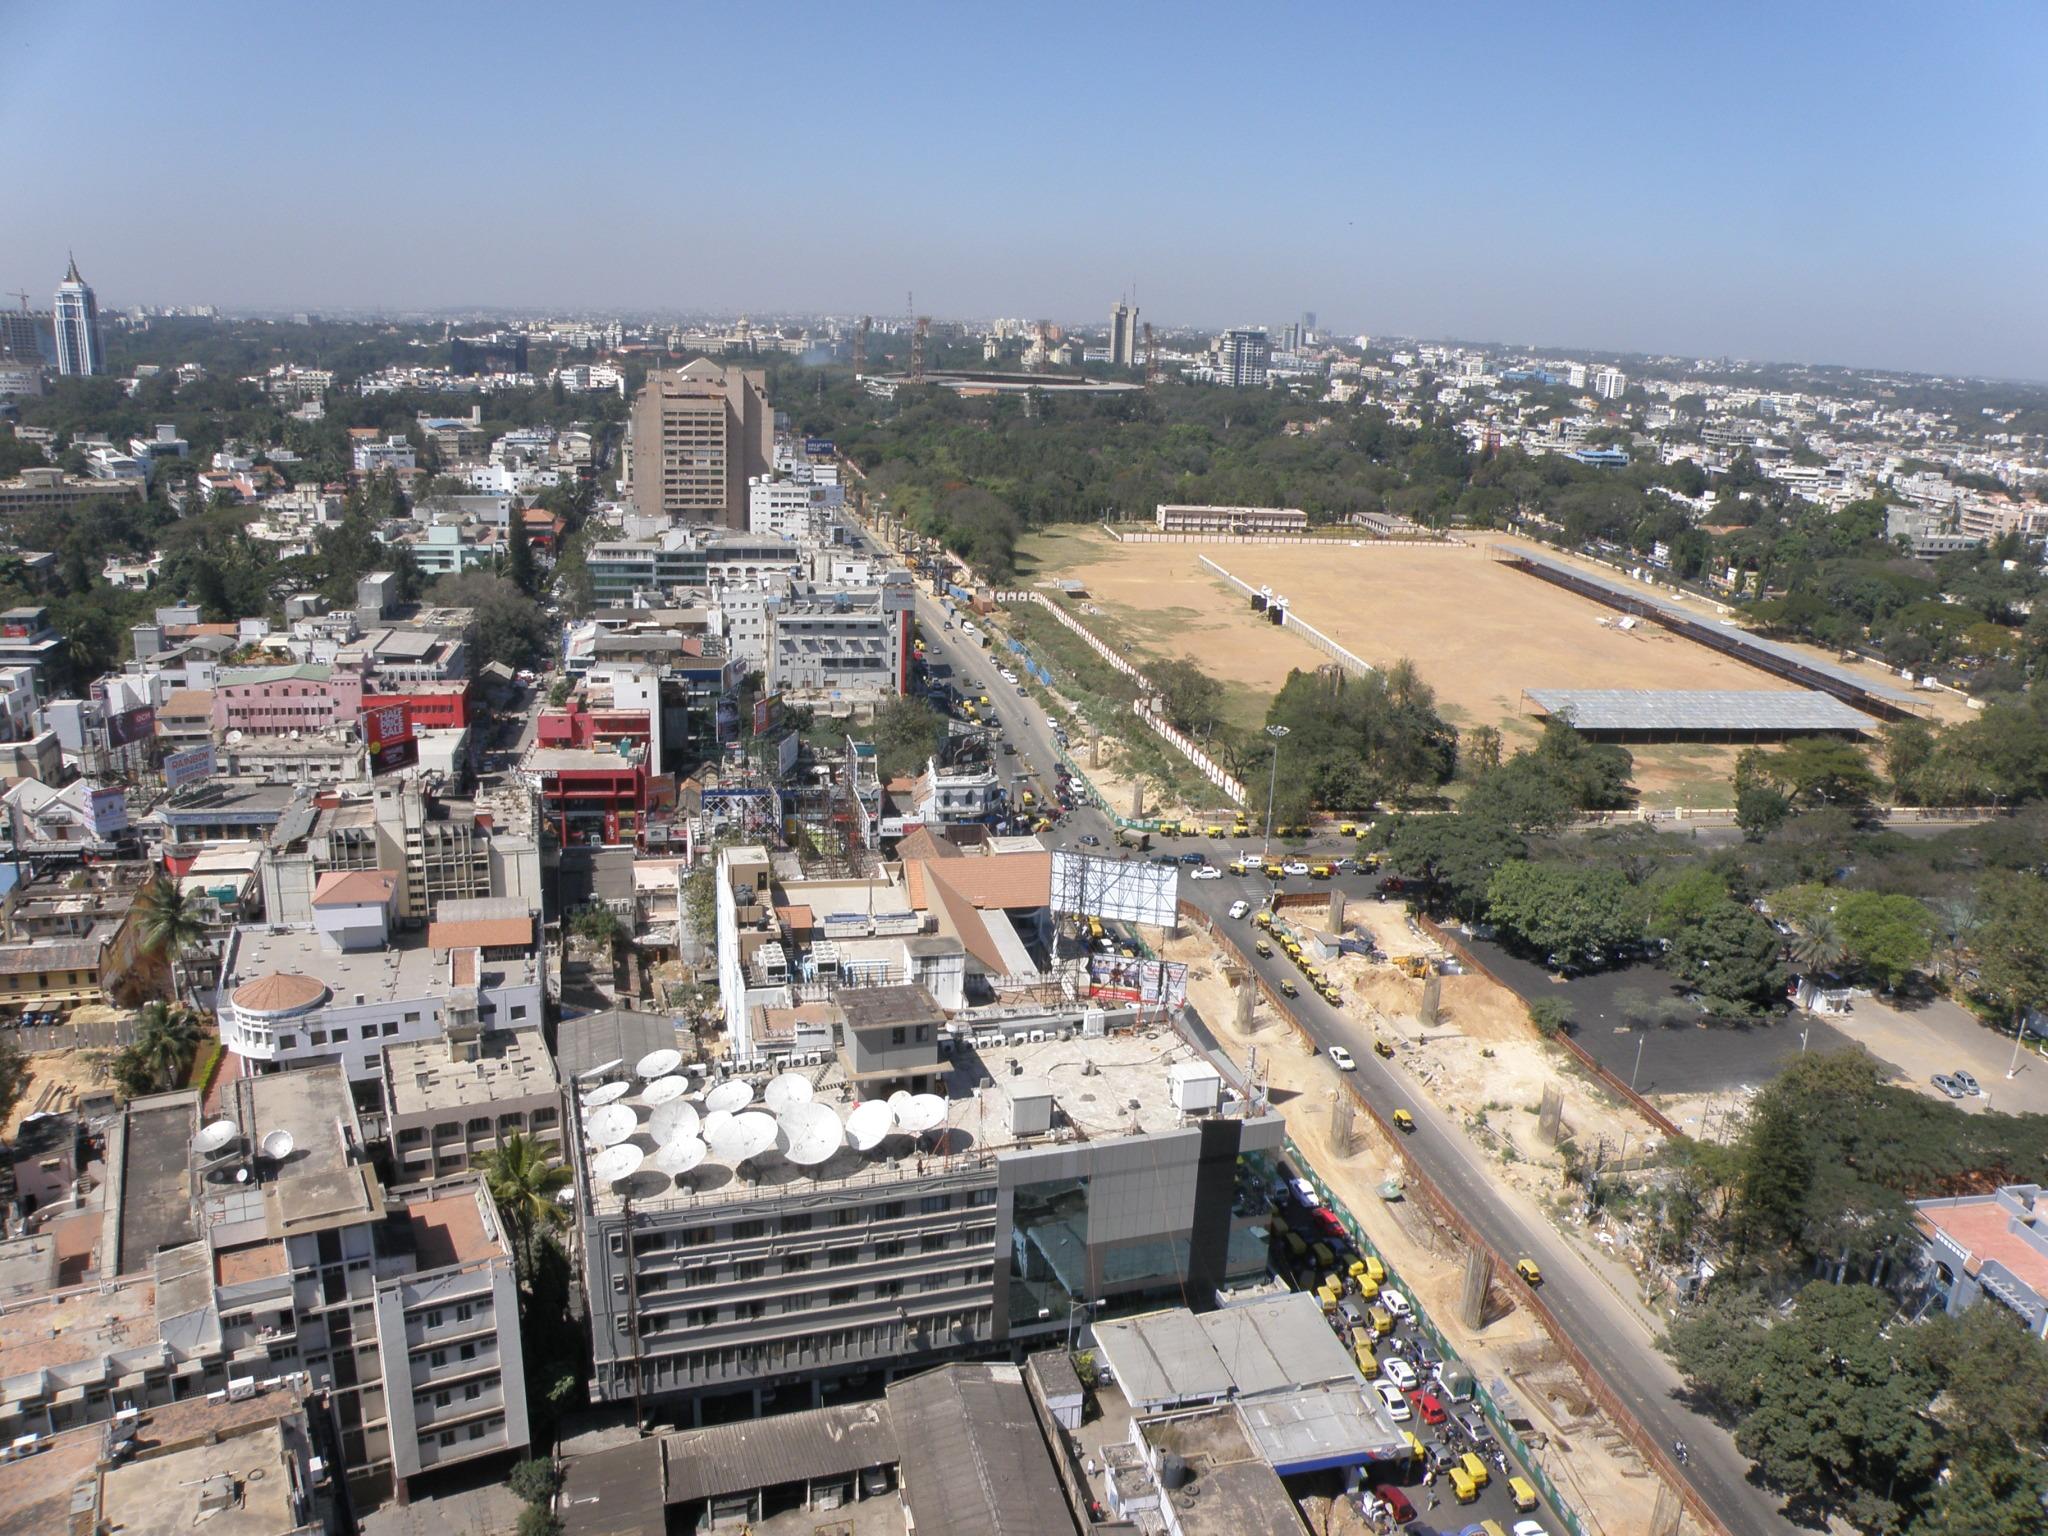 serwisy randkowe Bangalore Indie cs go matchmaking verbindungsprobleme